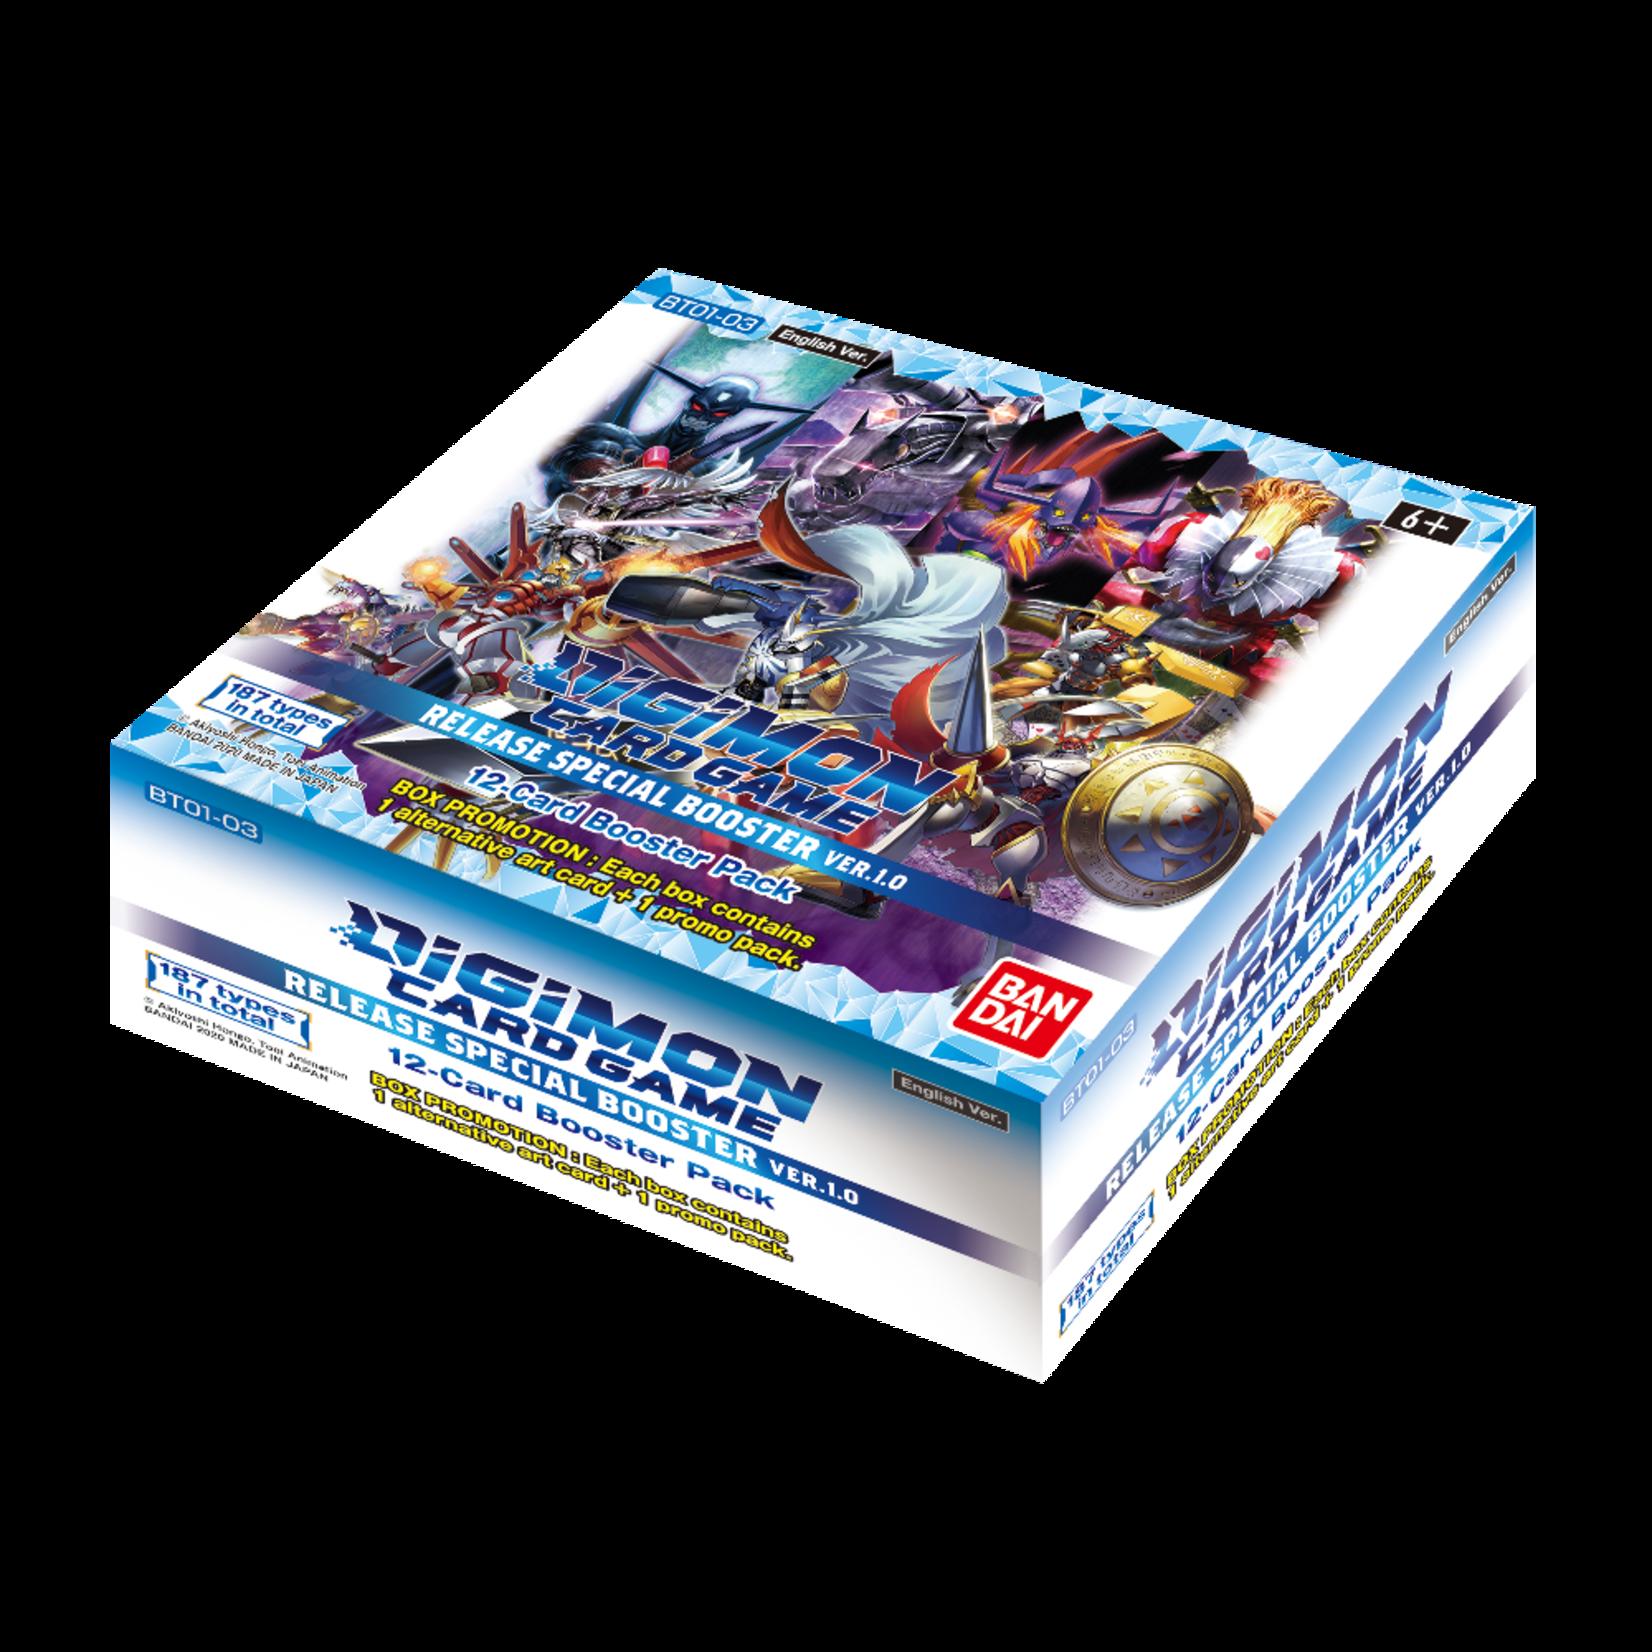 Bandai Digimon Trading Card Game: V1.0 Booster Box